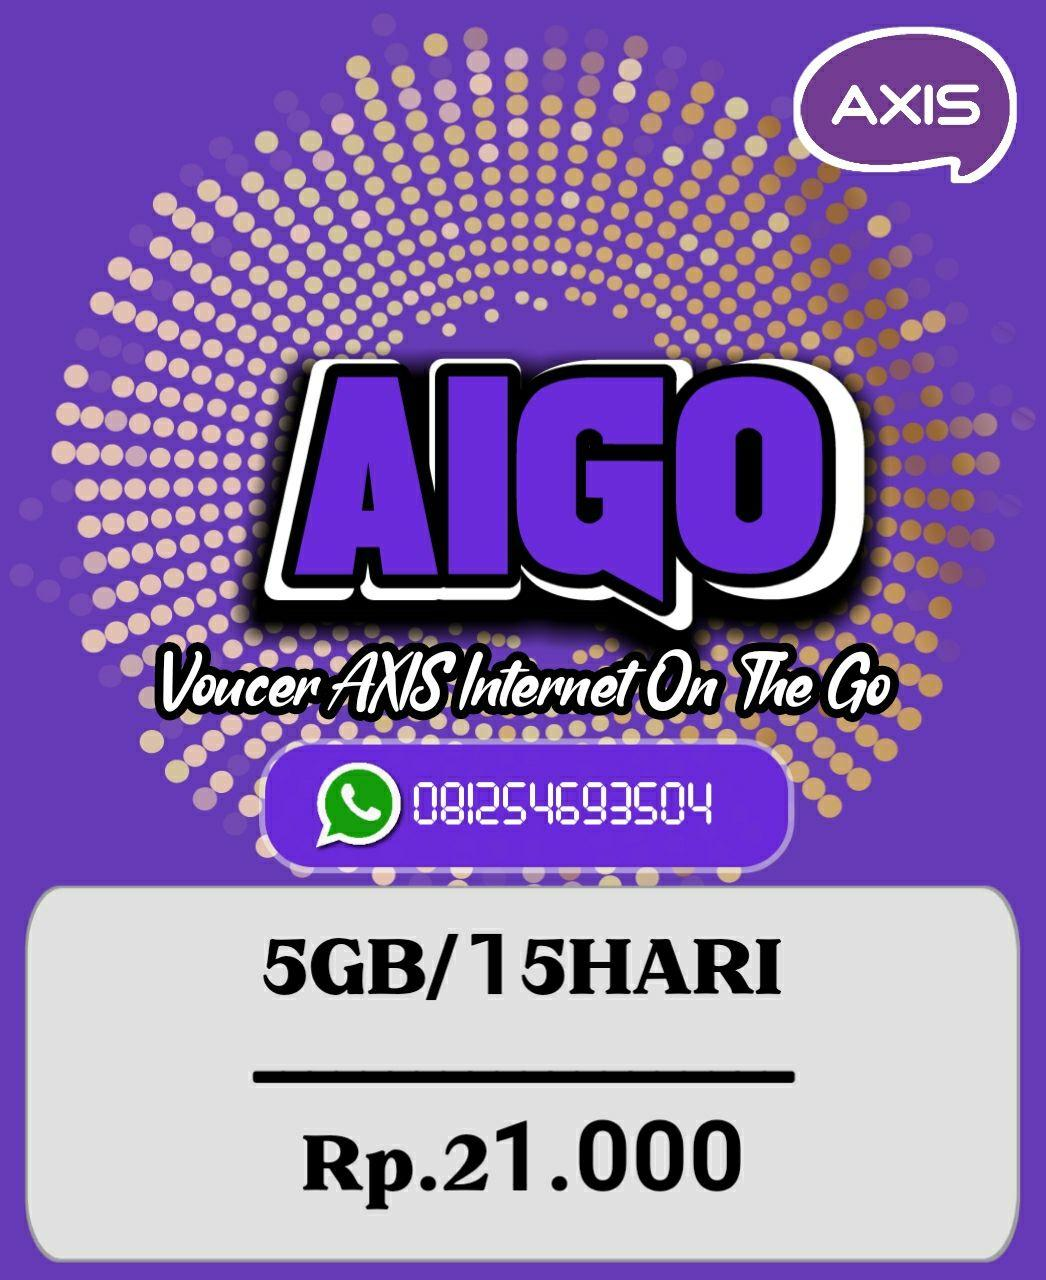 Voucer Axis 5GB/15HARI